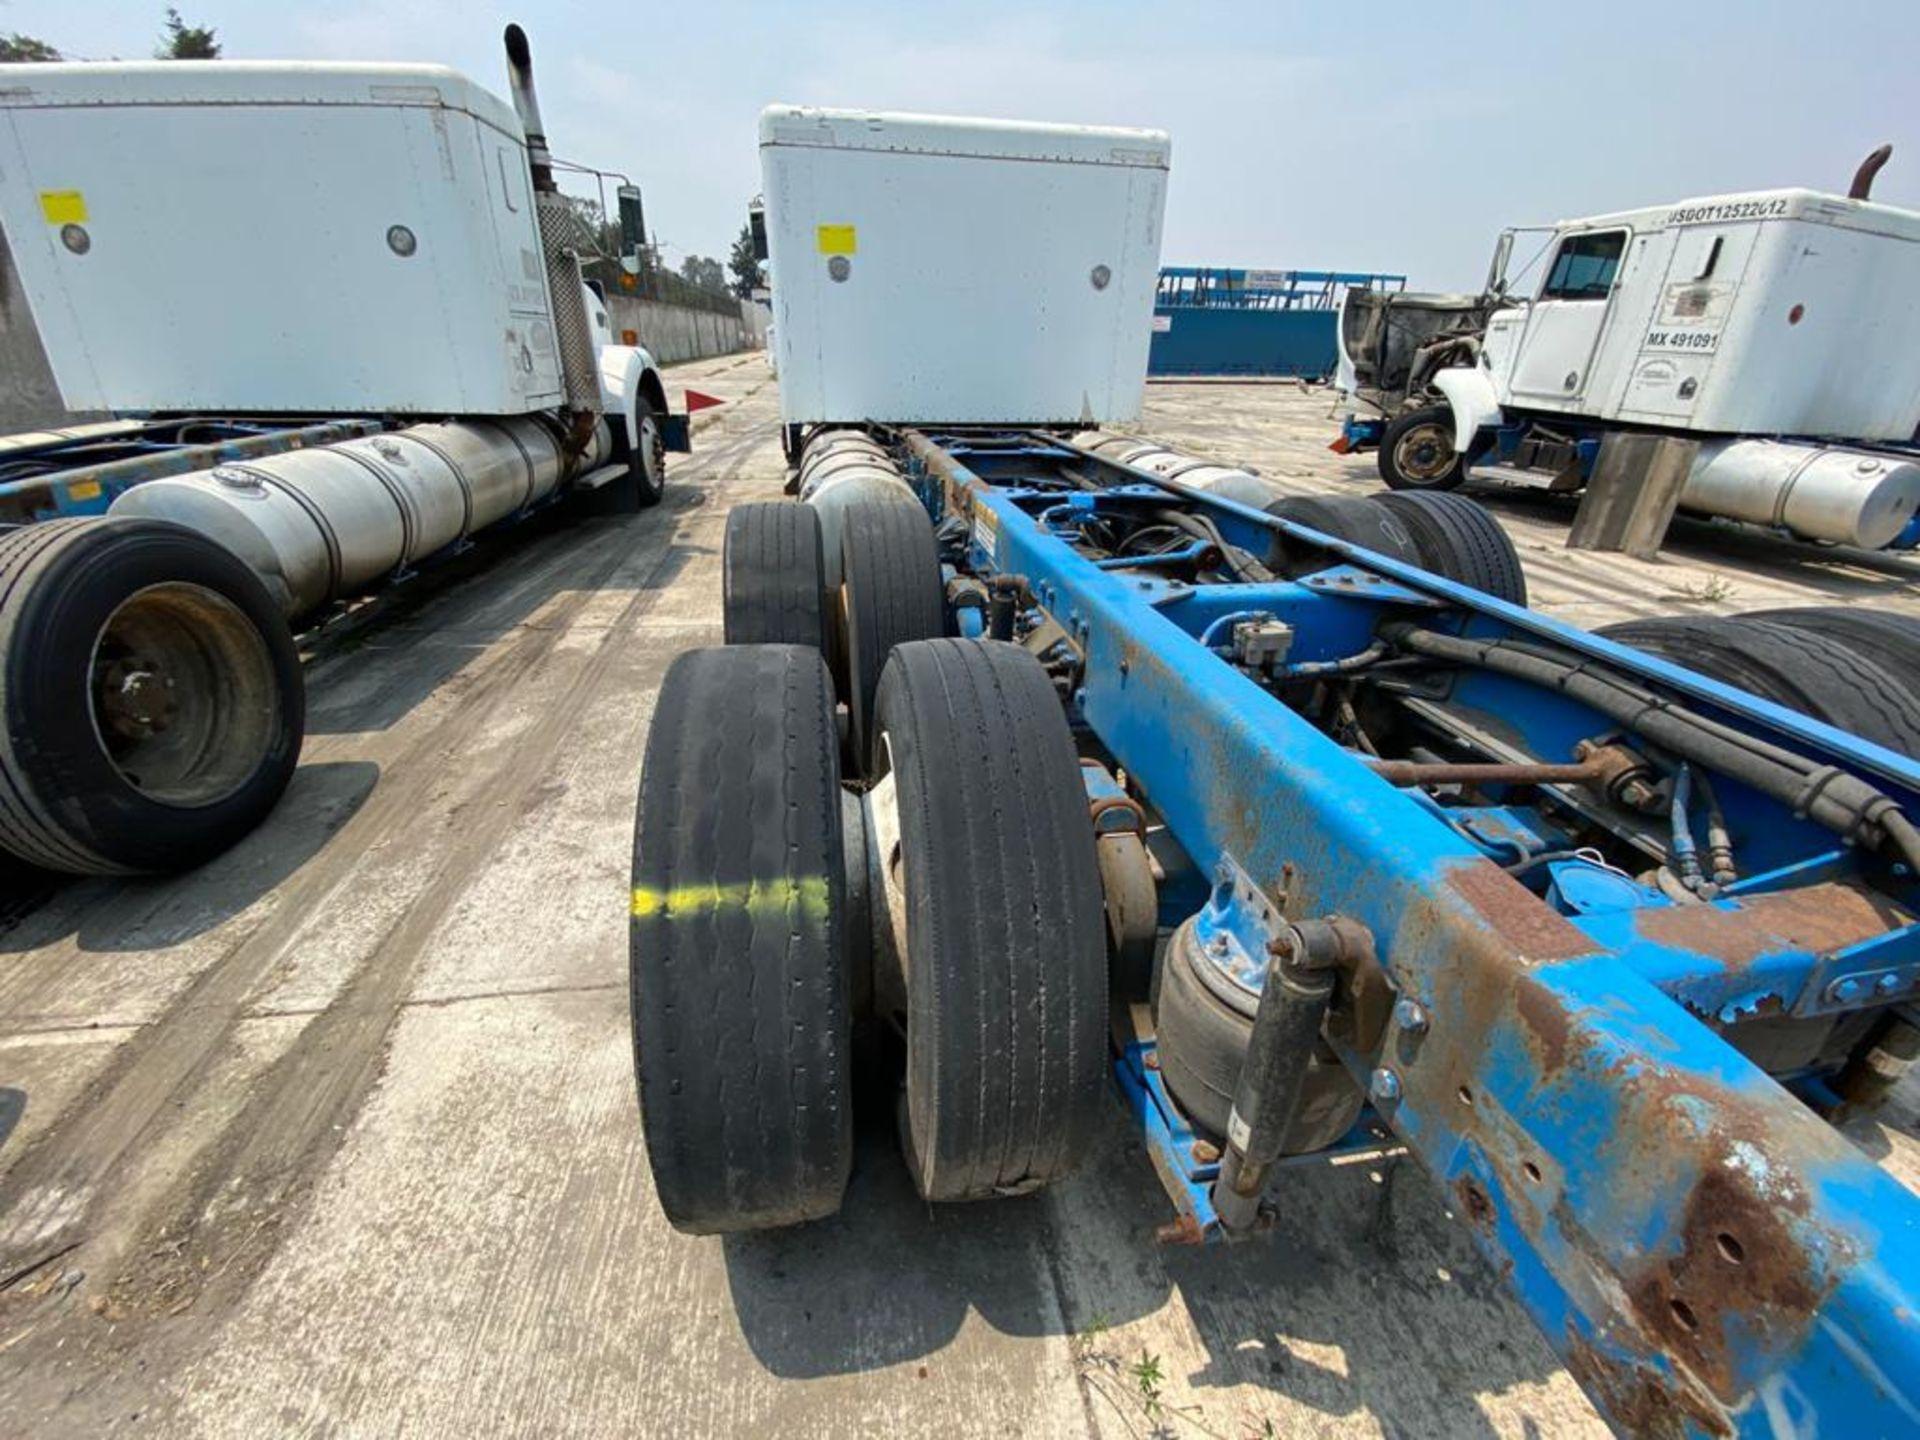 1999 Kenworth Sleeper truck tractor, standard transmission of 18 speeds - Image 17 of 70